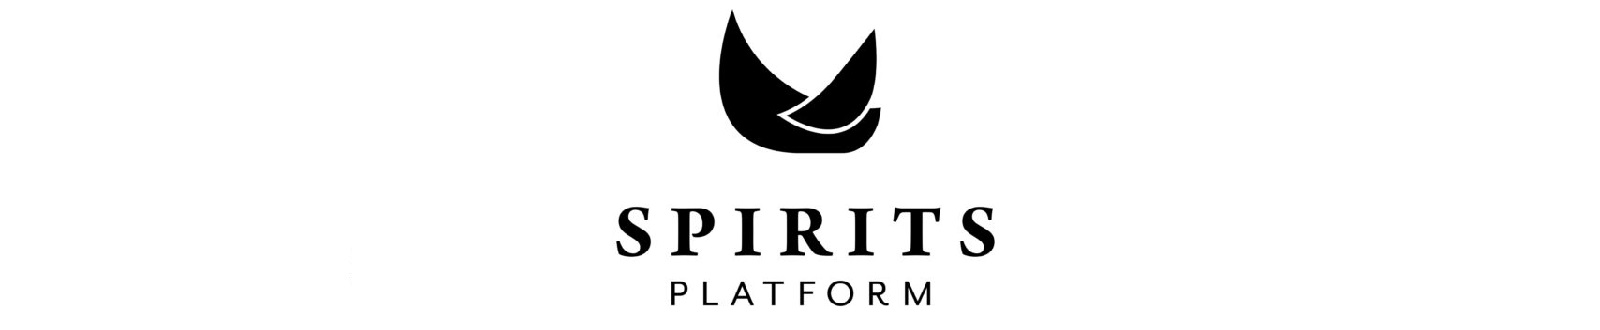 Spirits Platform - Case Study